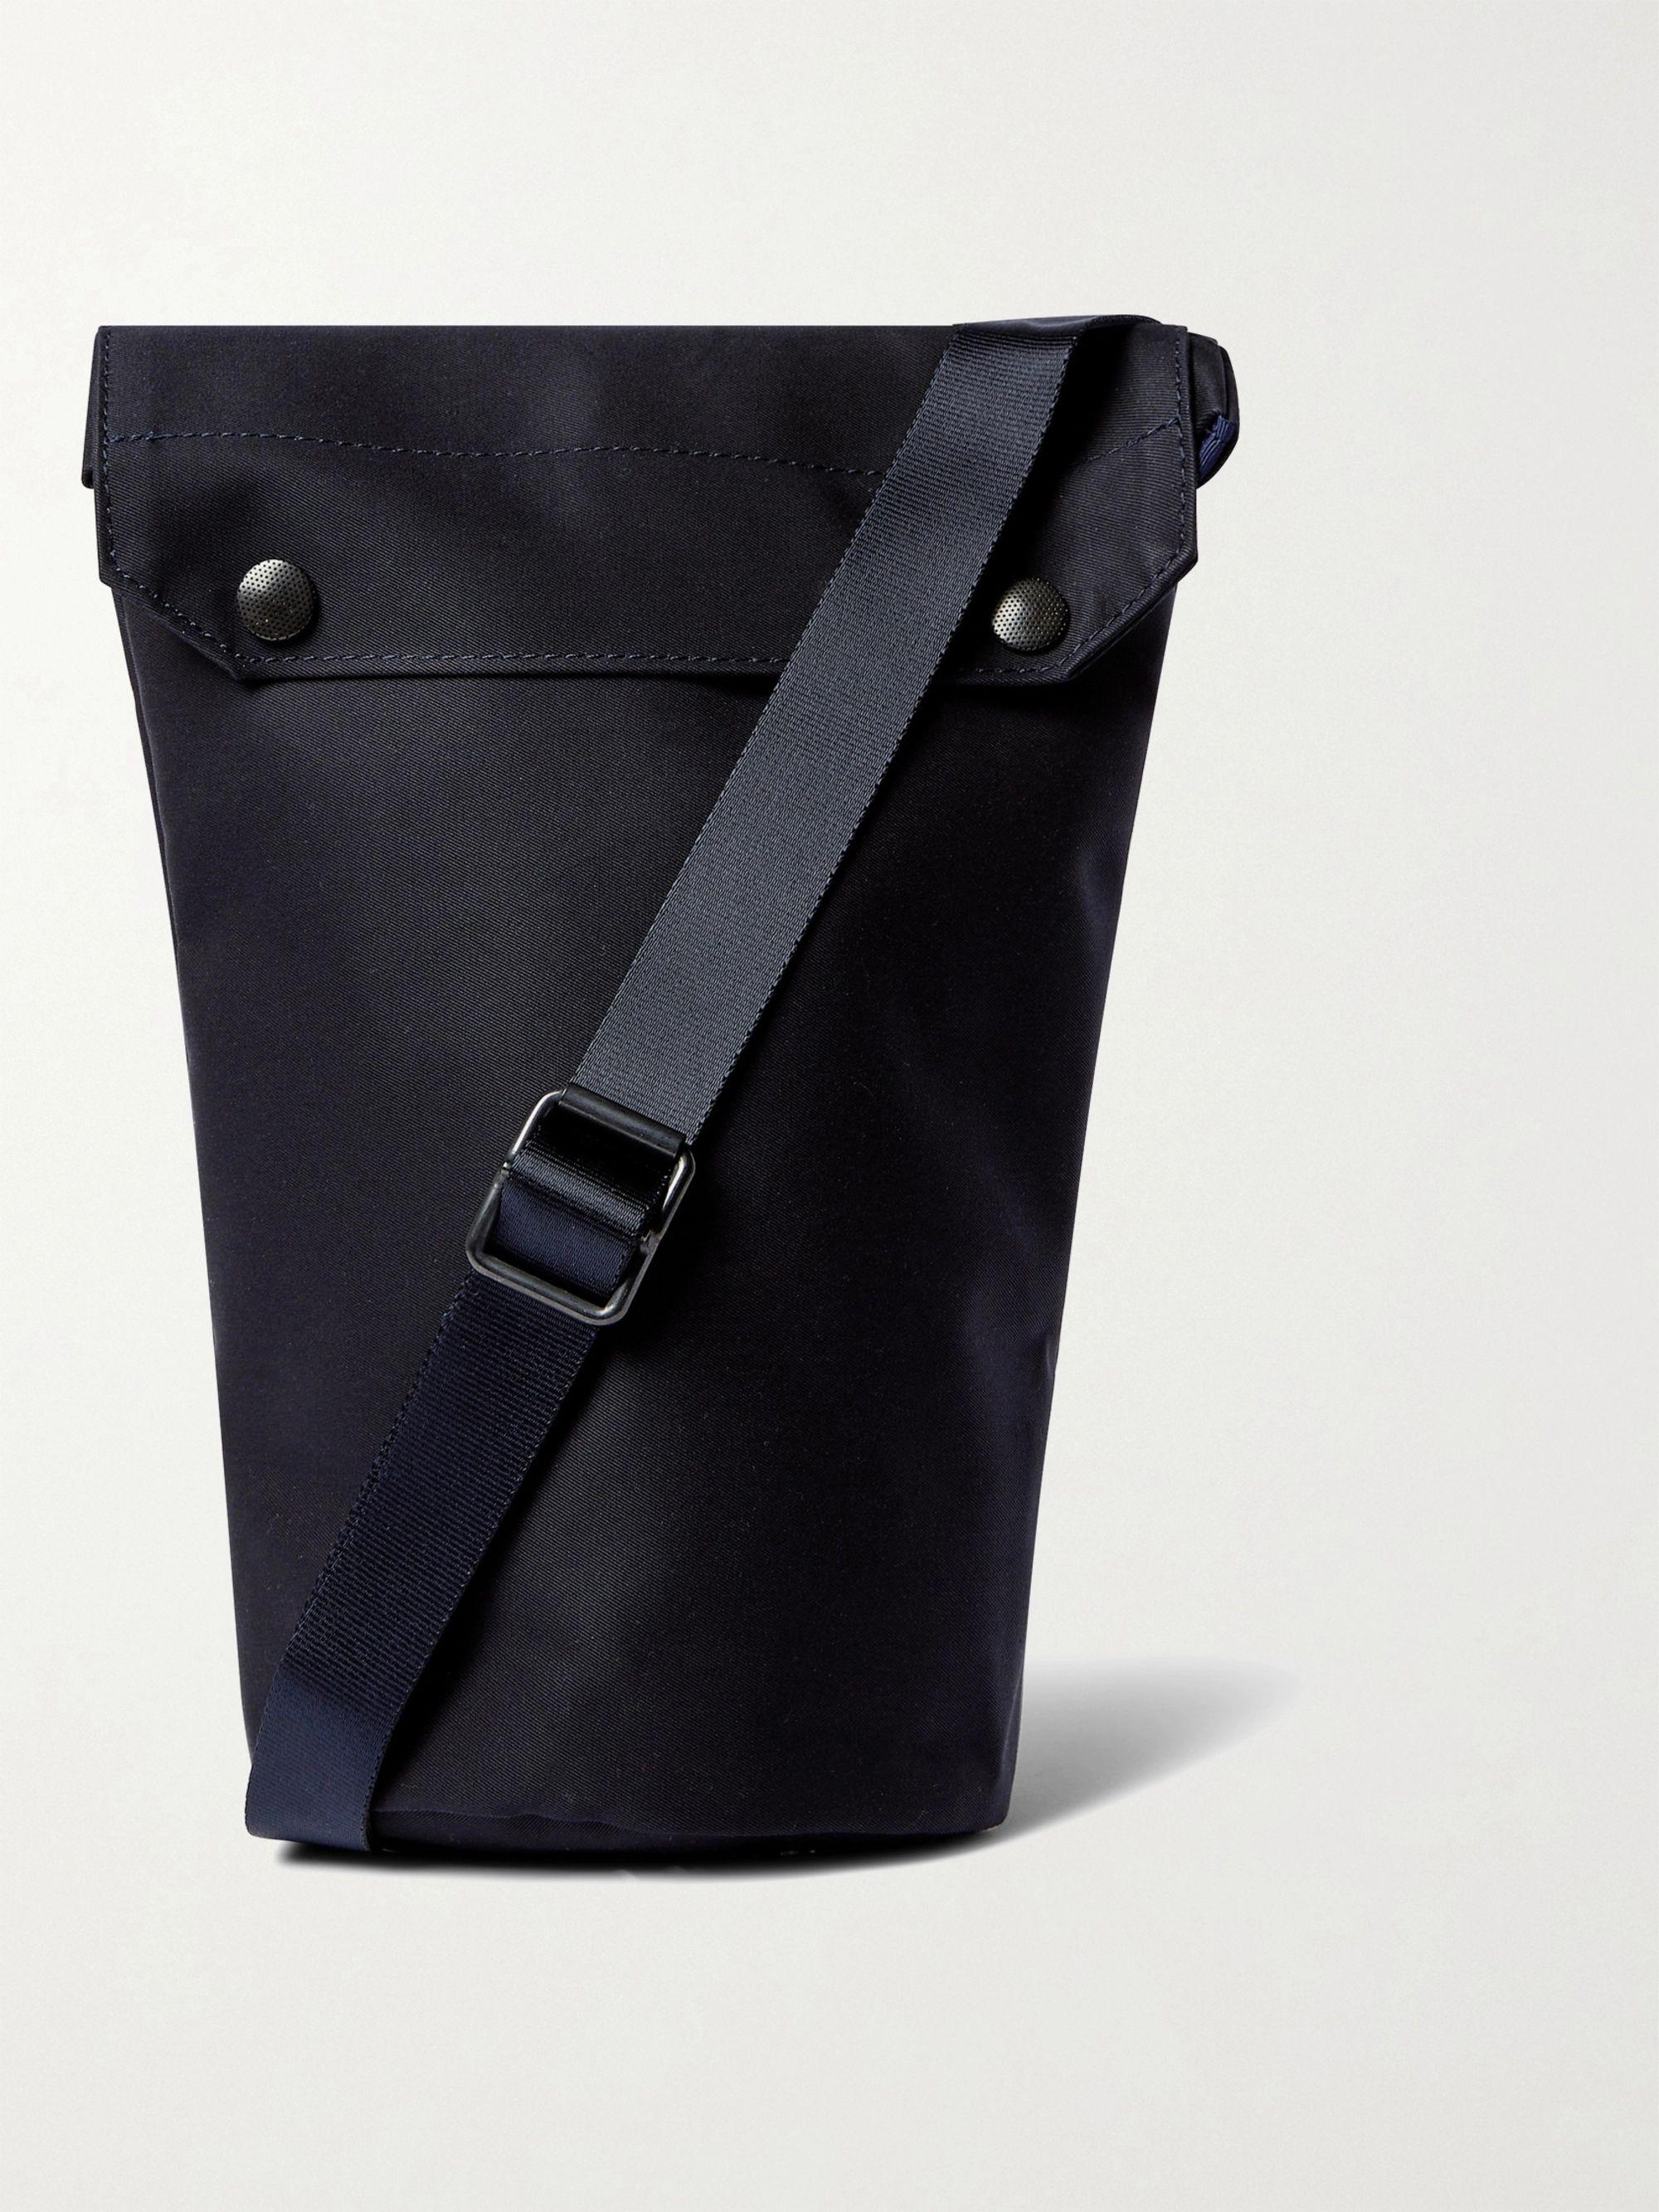 NANAMICA Cotton-Shell Messenger Bag,Navy